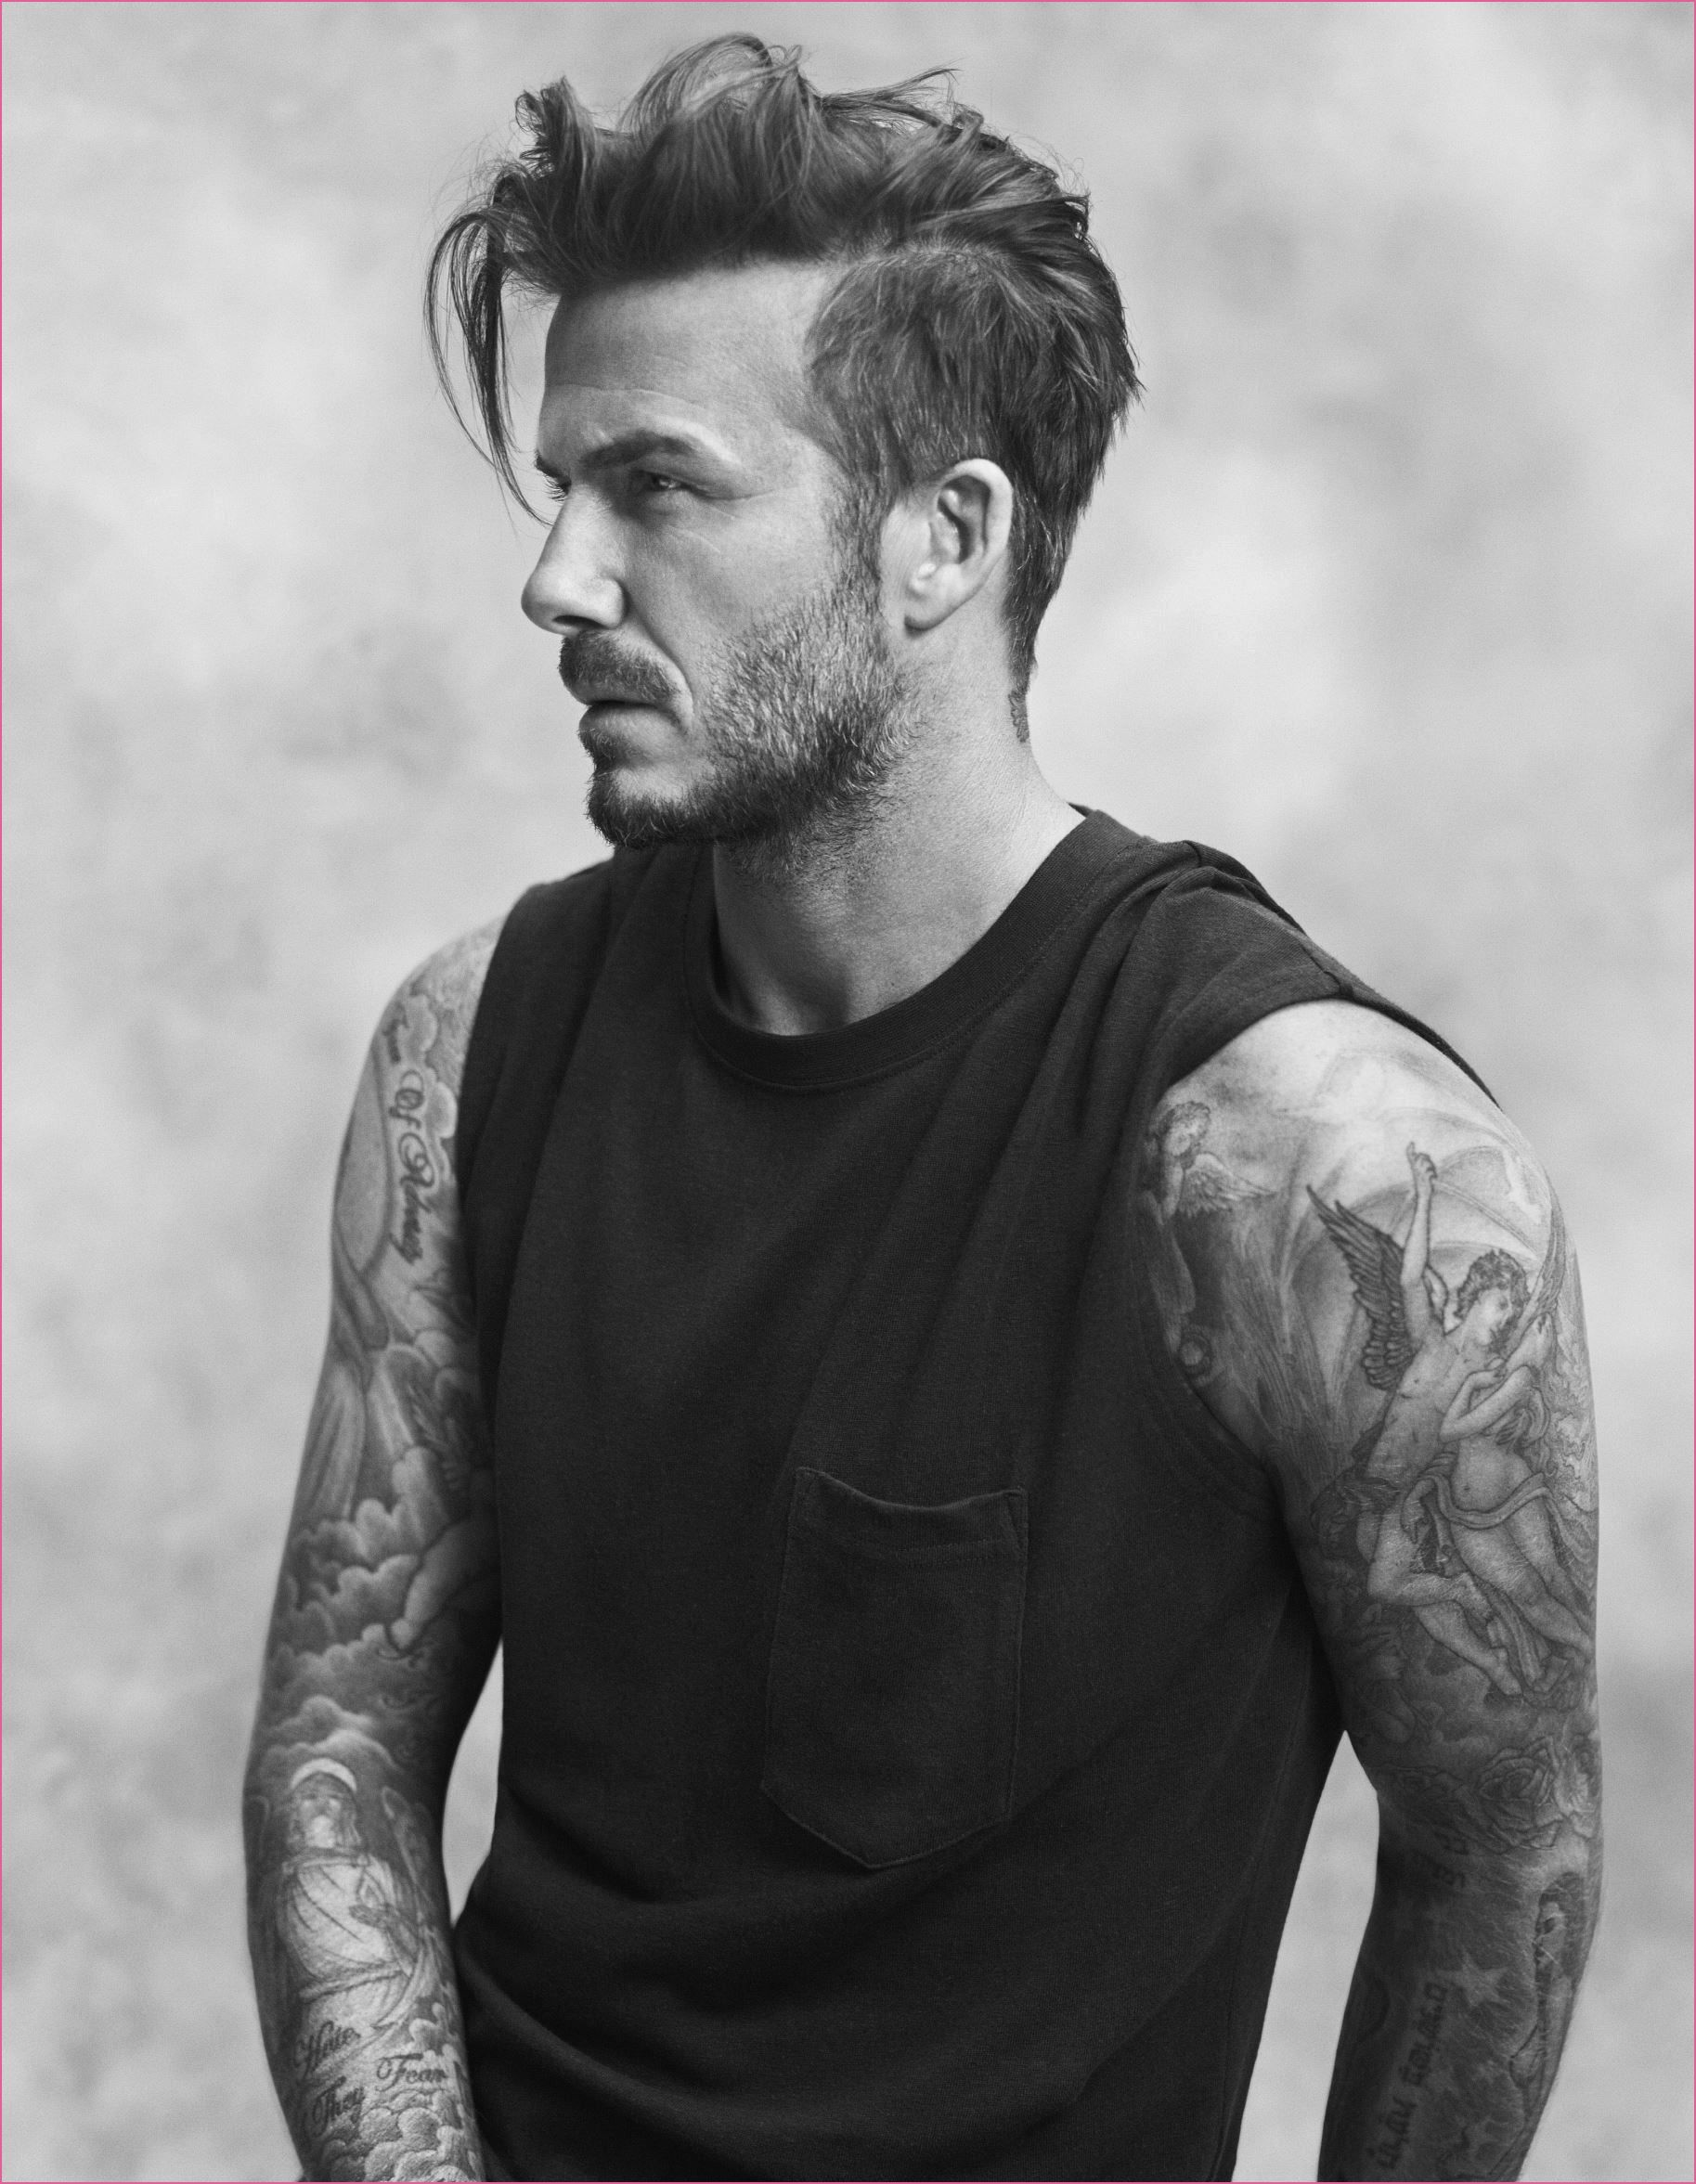 David Beckham Frisuren In 2020 David Beckham Hairstyle Mens Hairstyles Undercut David Beckham